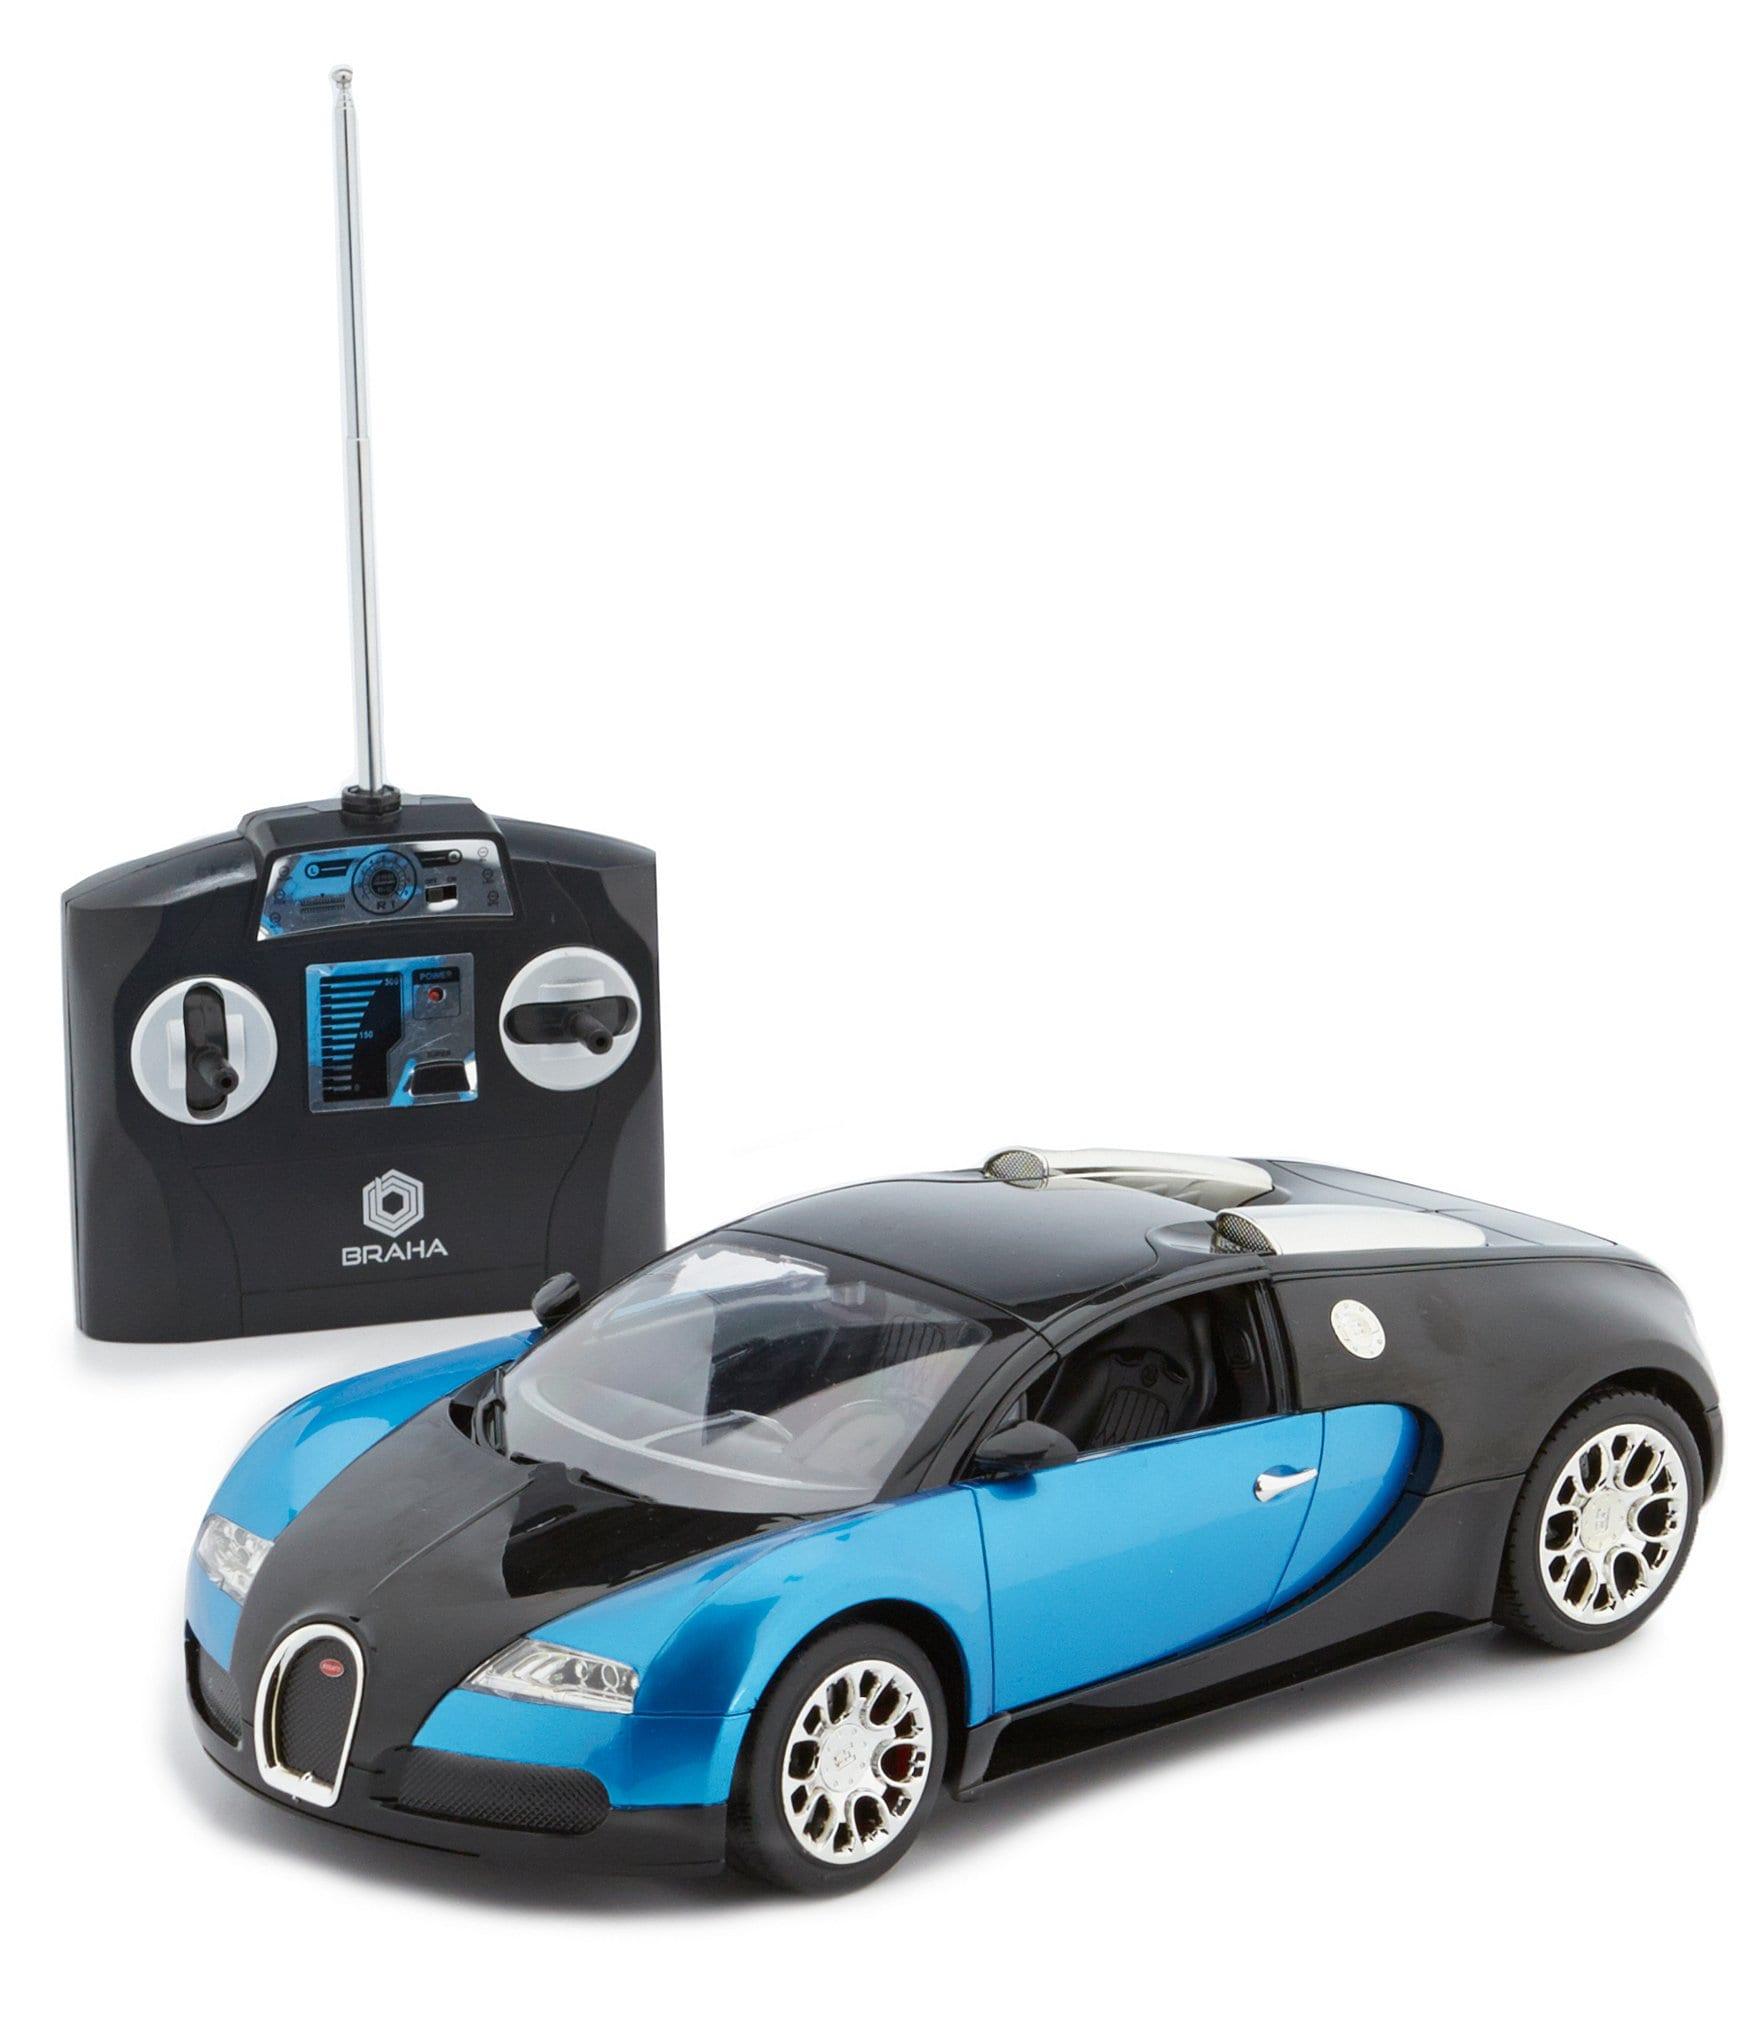 braha bugatti veyron remote control car dillards. Black Bedroom Furniture Sets. Home Design Ideas